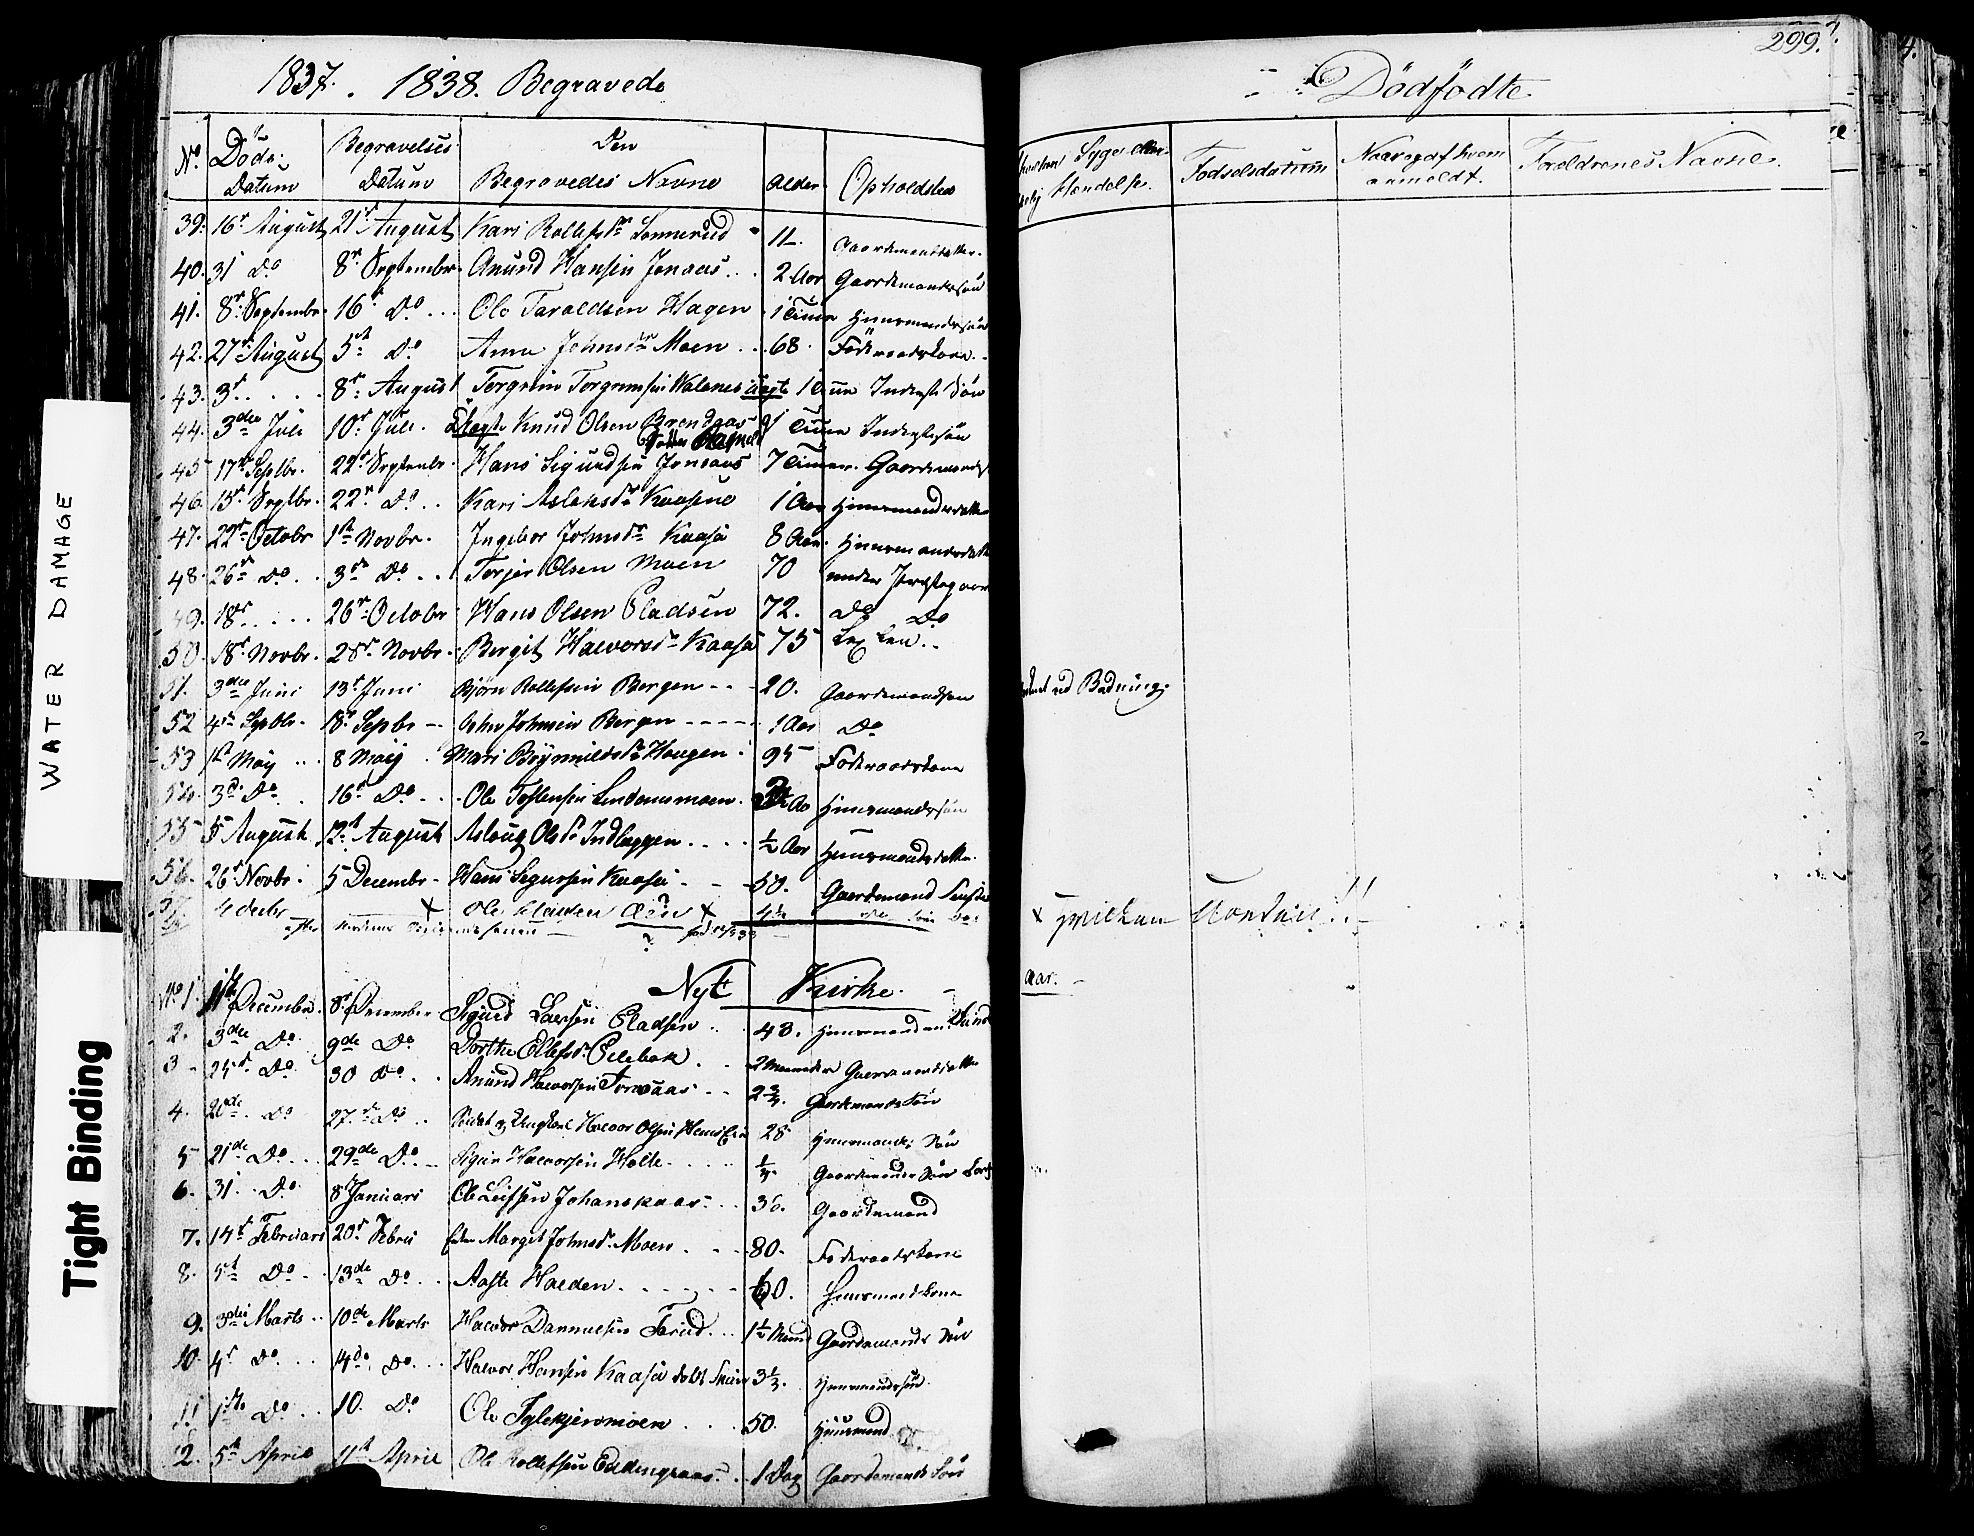 SAKO, Sauherad kirkebøker, F/Fa/L0006: Ministerialbok nr. I 6, 1827-1850, s. 299